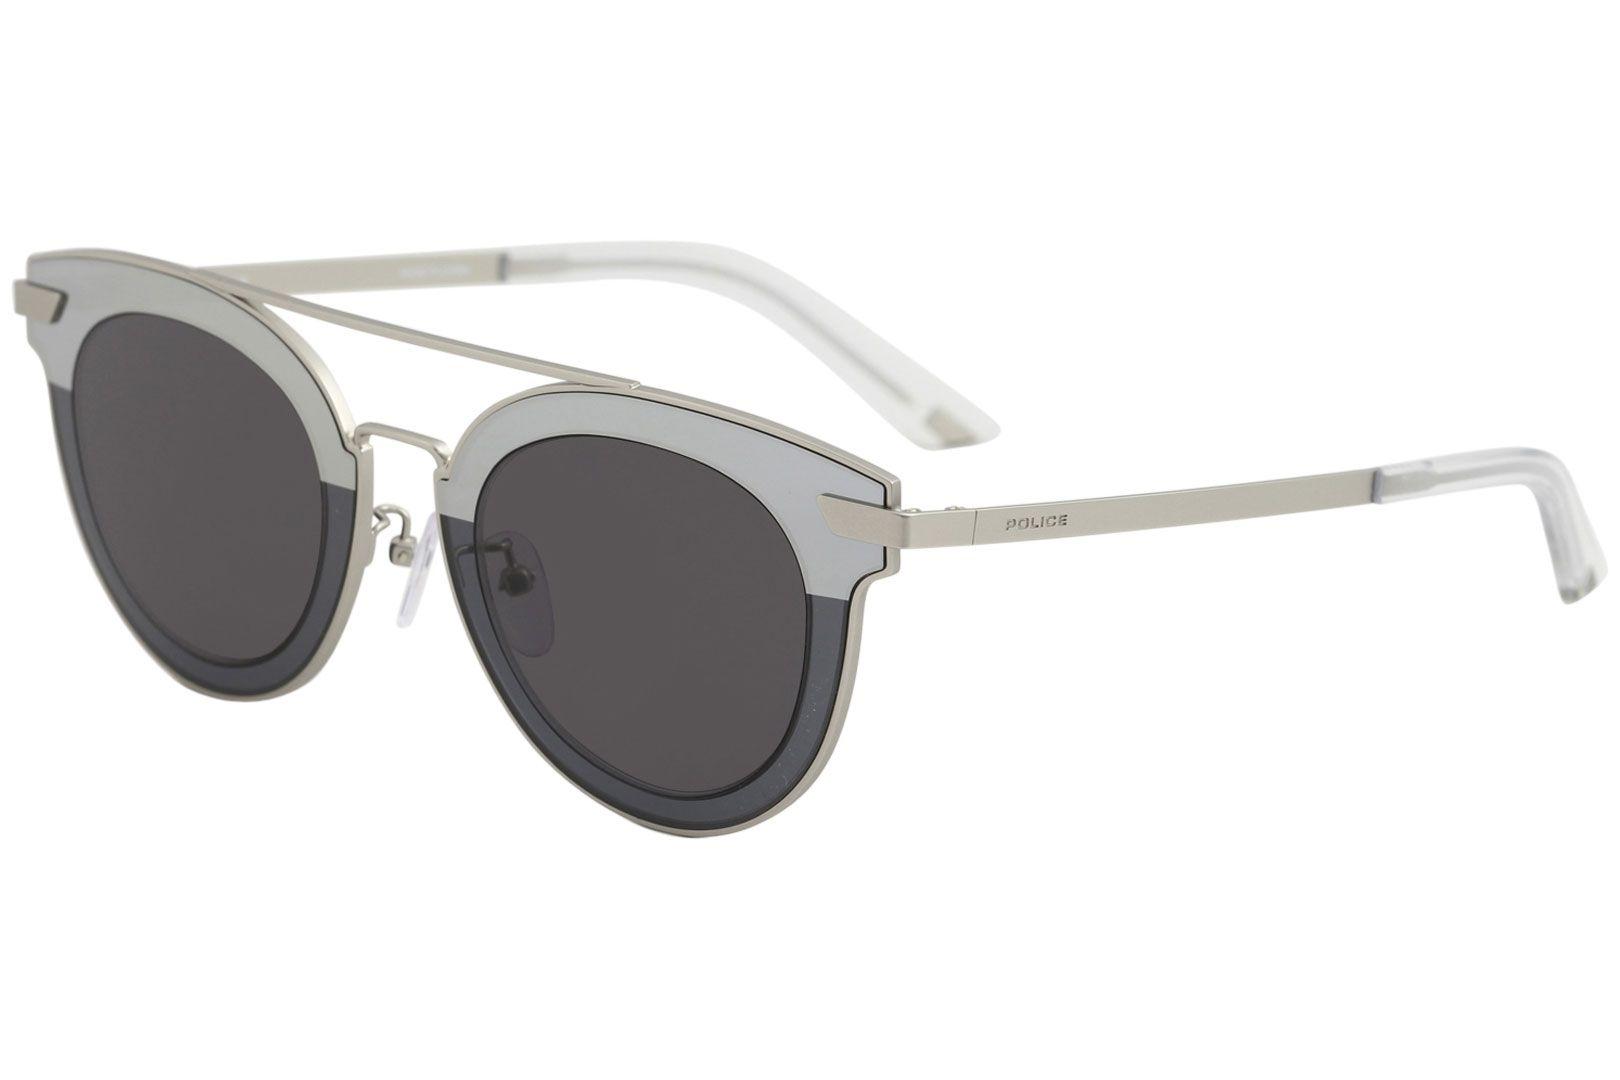 de1d8f03a سعر Police Police Sunglasses فى مصر | جوميا | نظارات | كان بكام